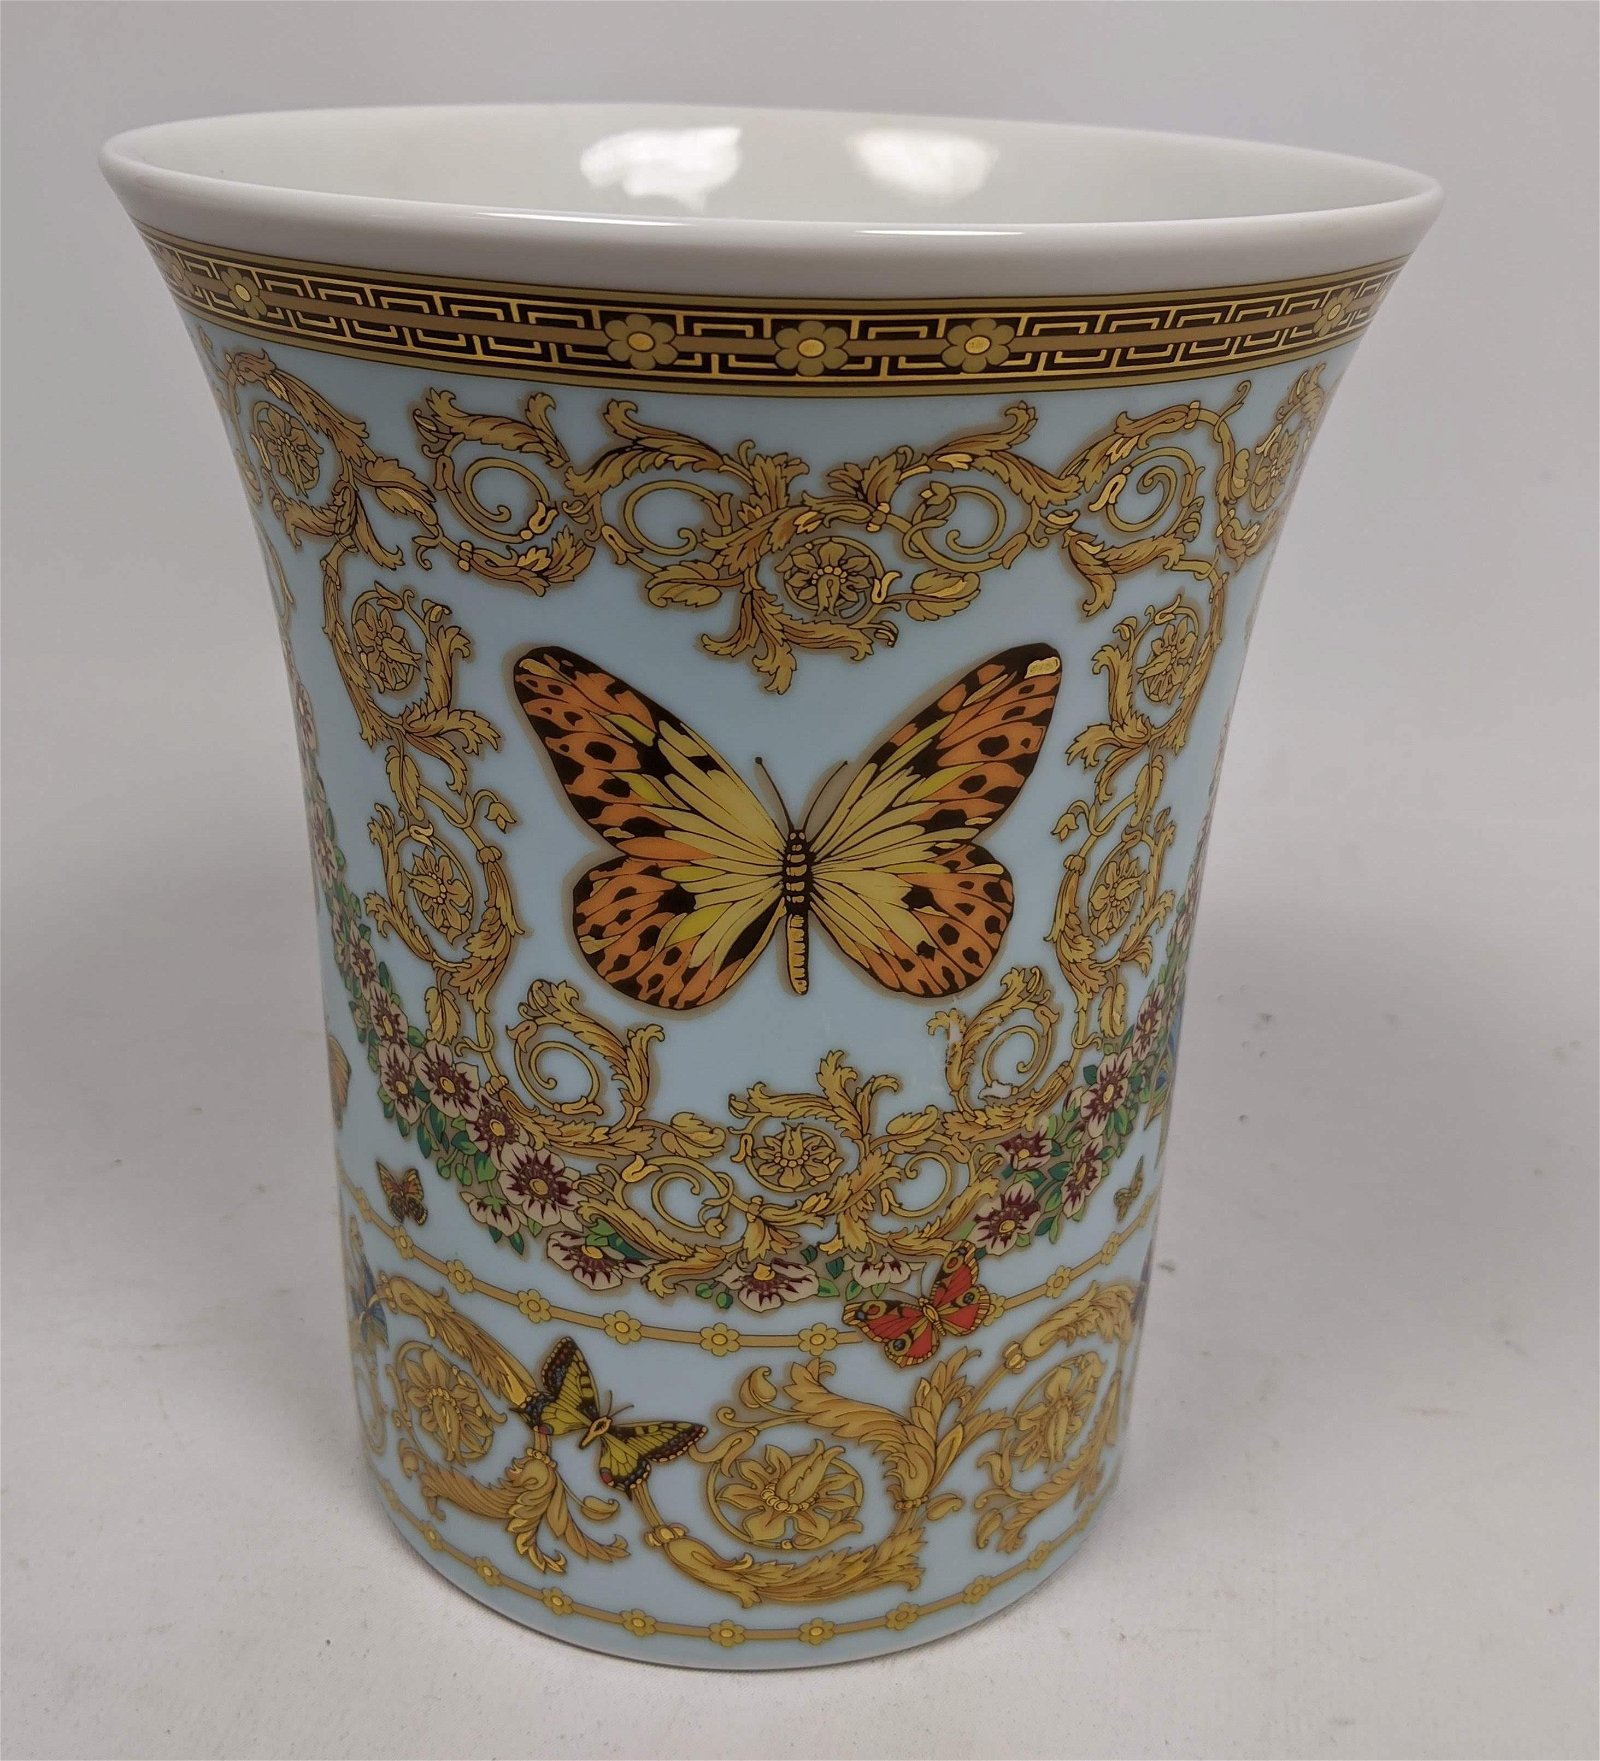 "GIANNI VERSACE for ROSENTHAL Butterfly Vase. ""Le jardin"